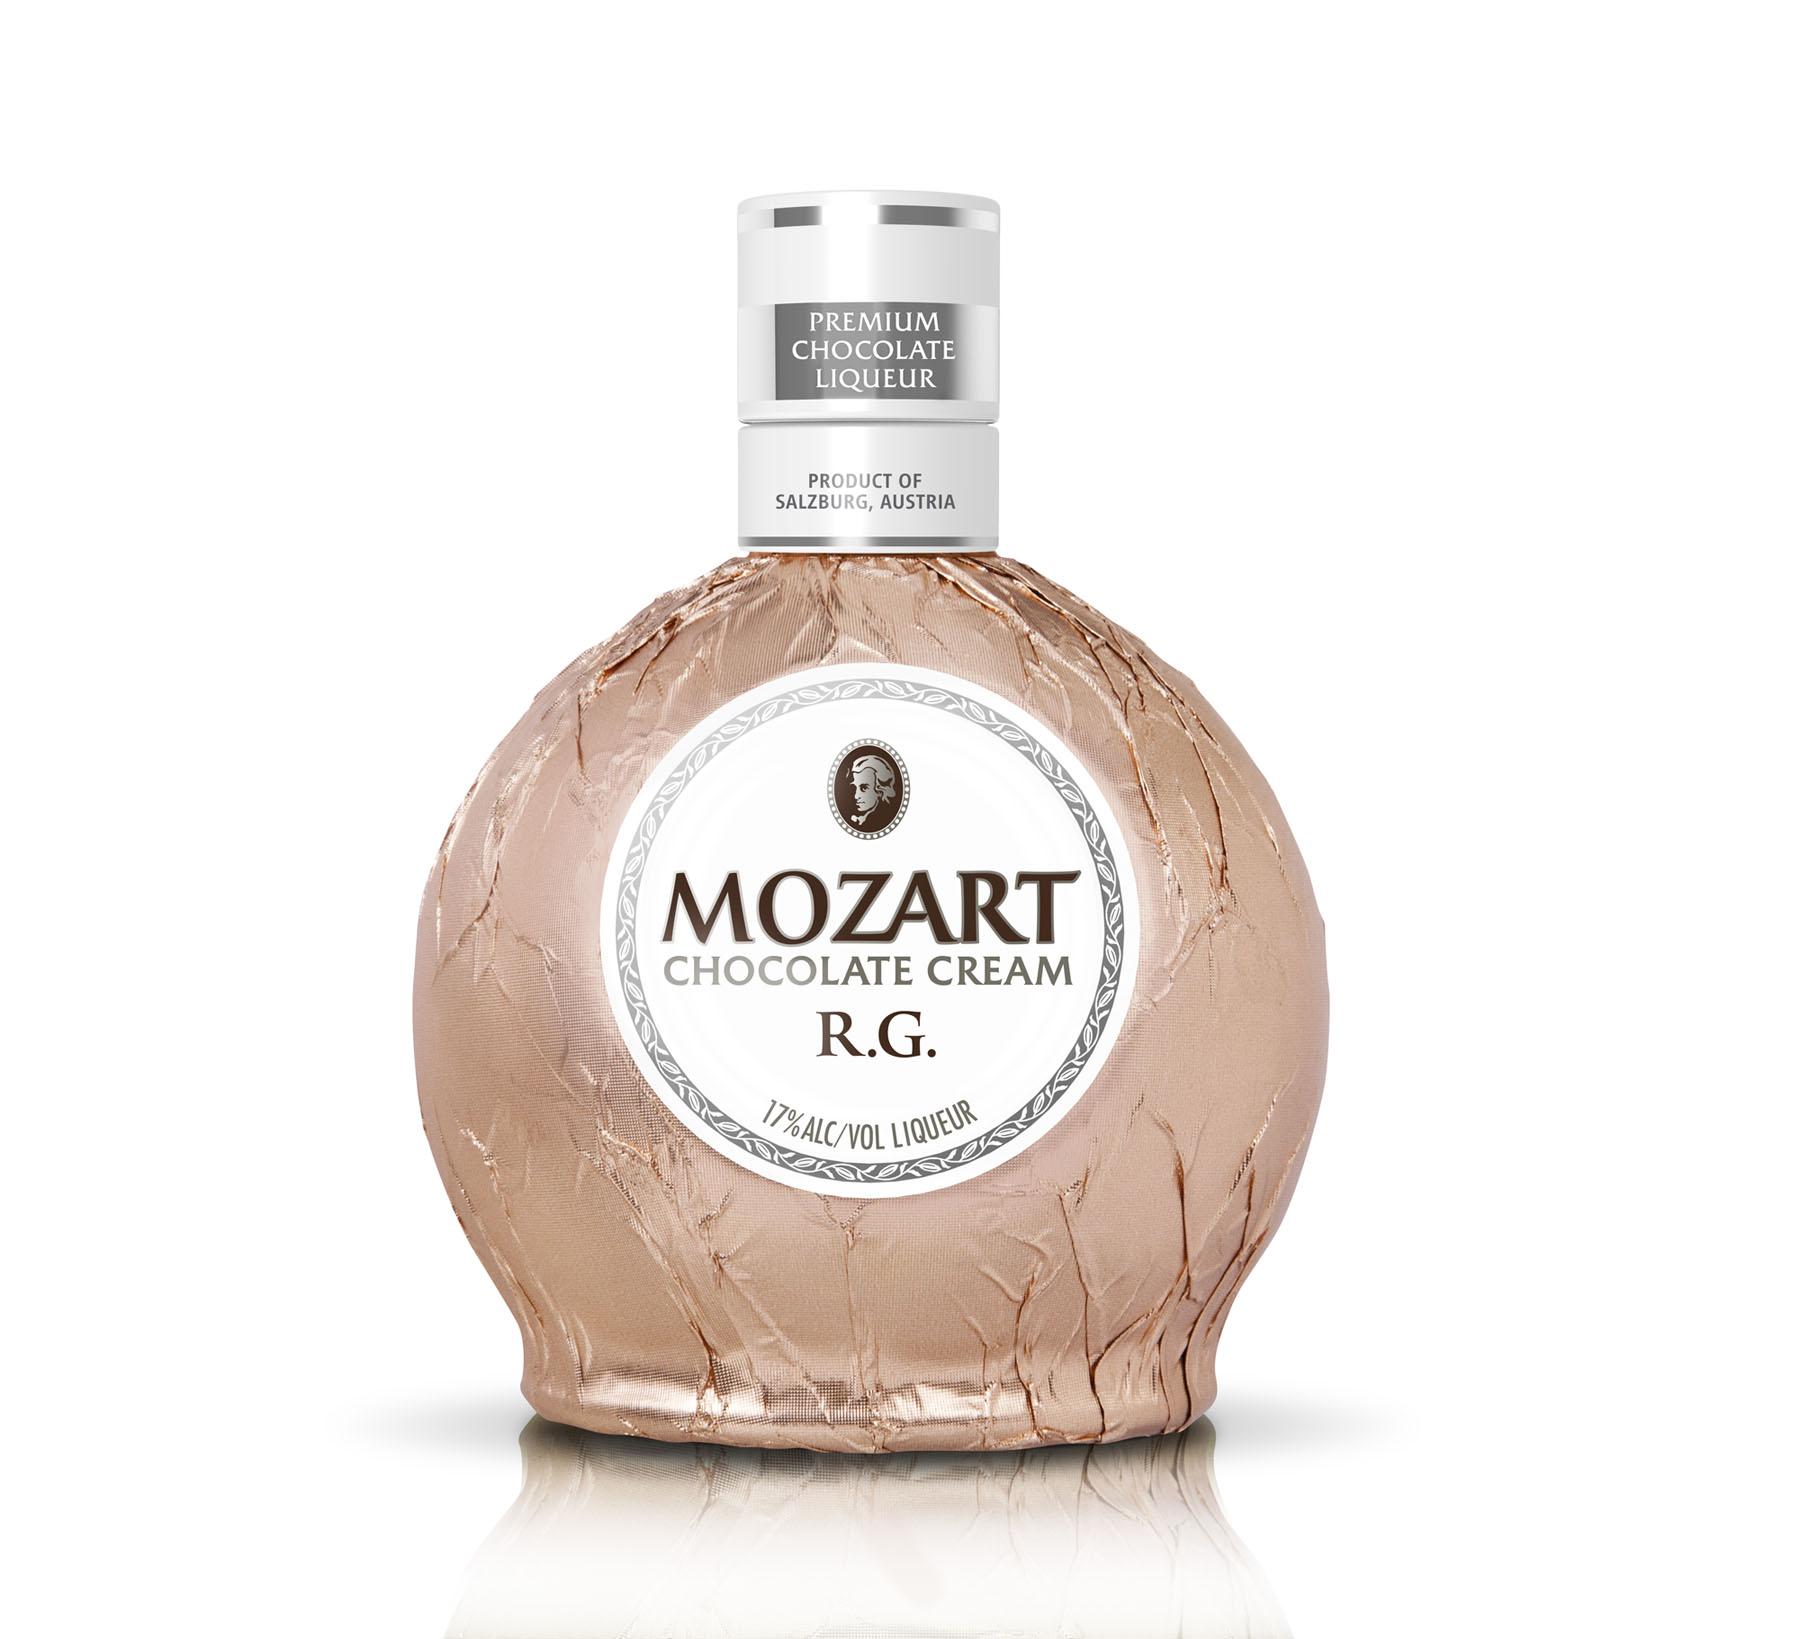 Ликёр моцарт своими руками